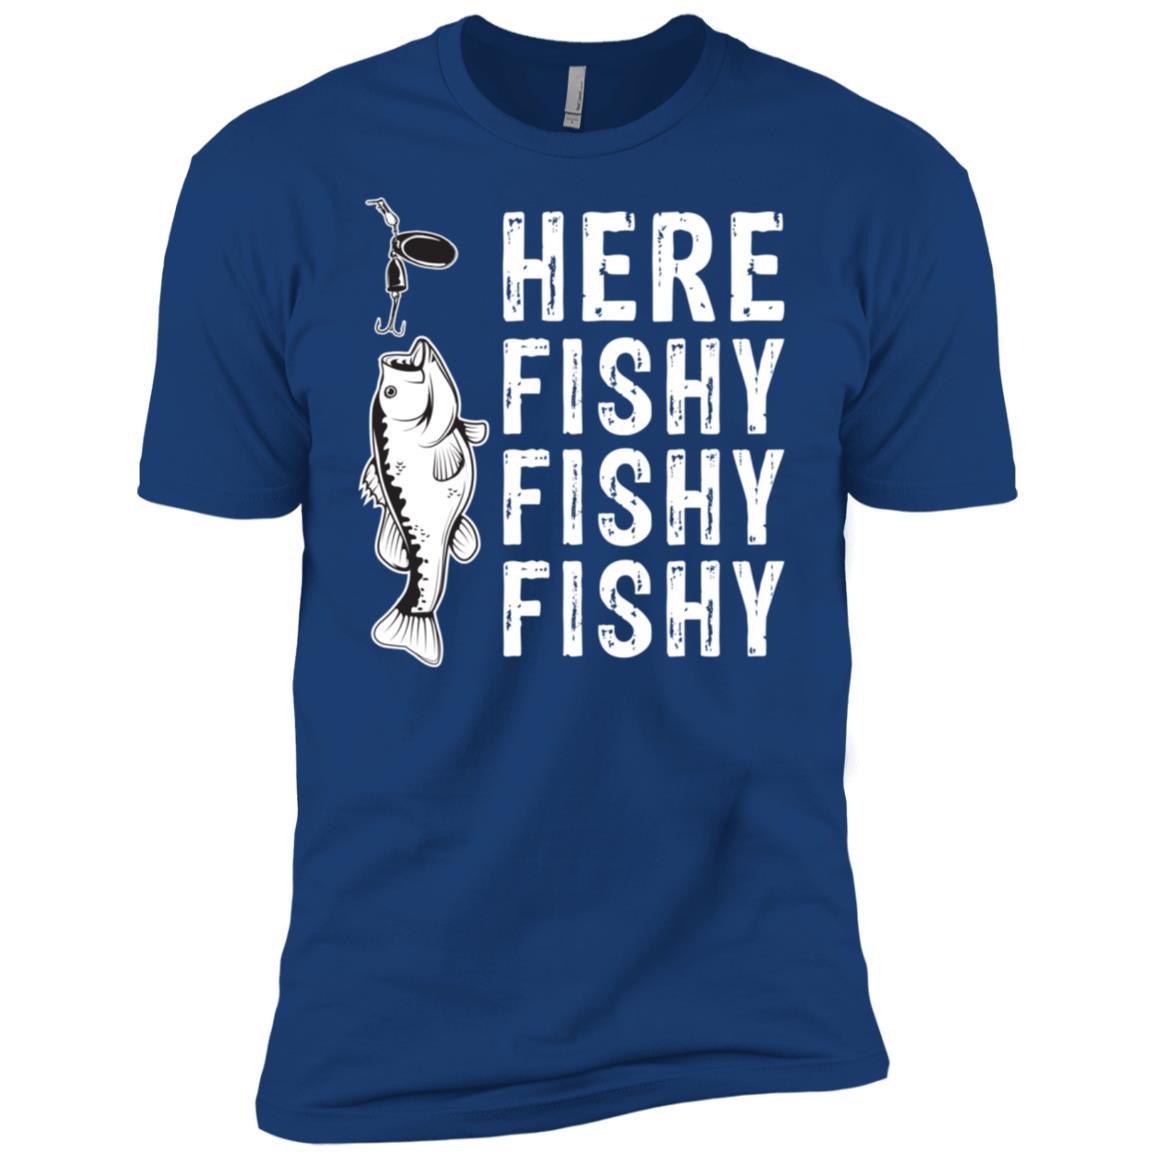 Here Fishy Fishy Fishy Tee Funny Outdoor Hunting Men Short Sleeve T-Shirt